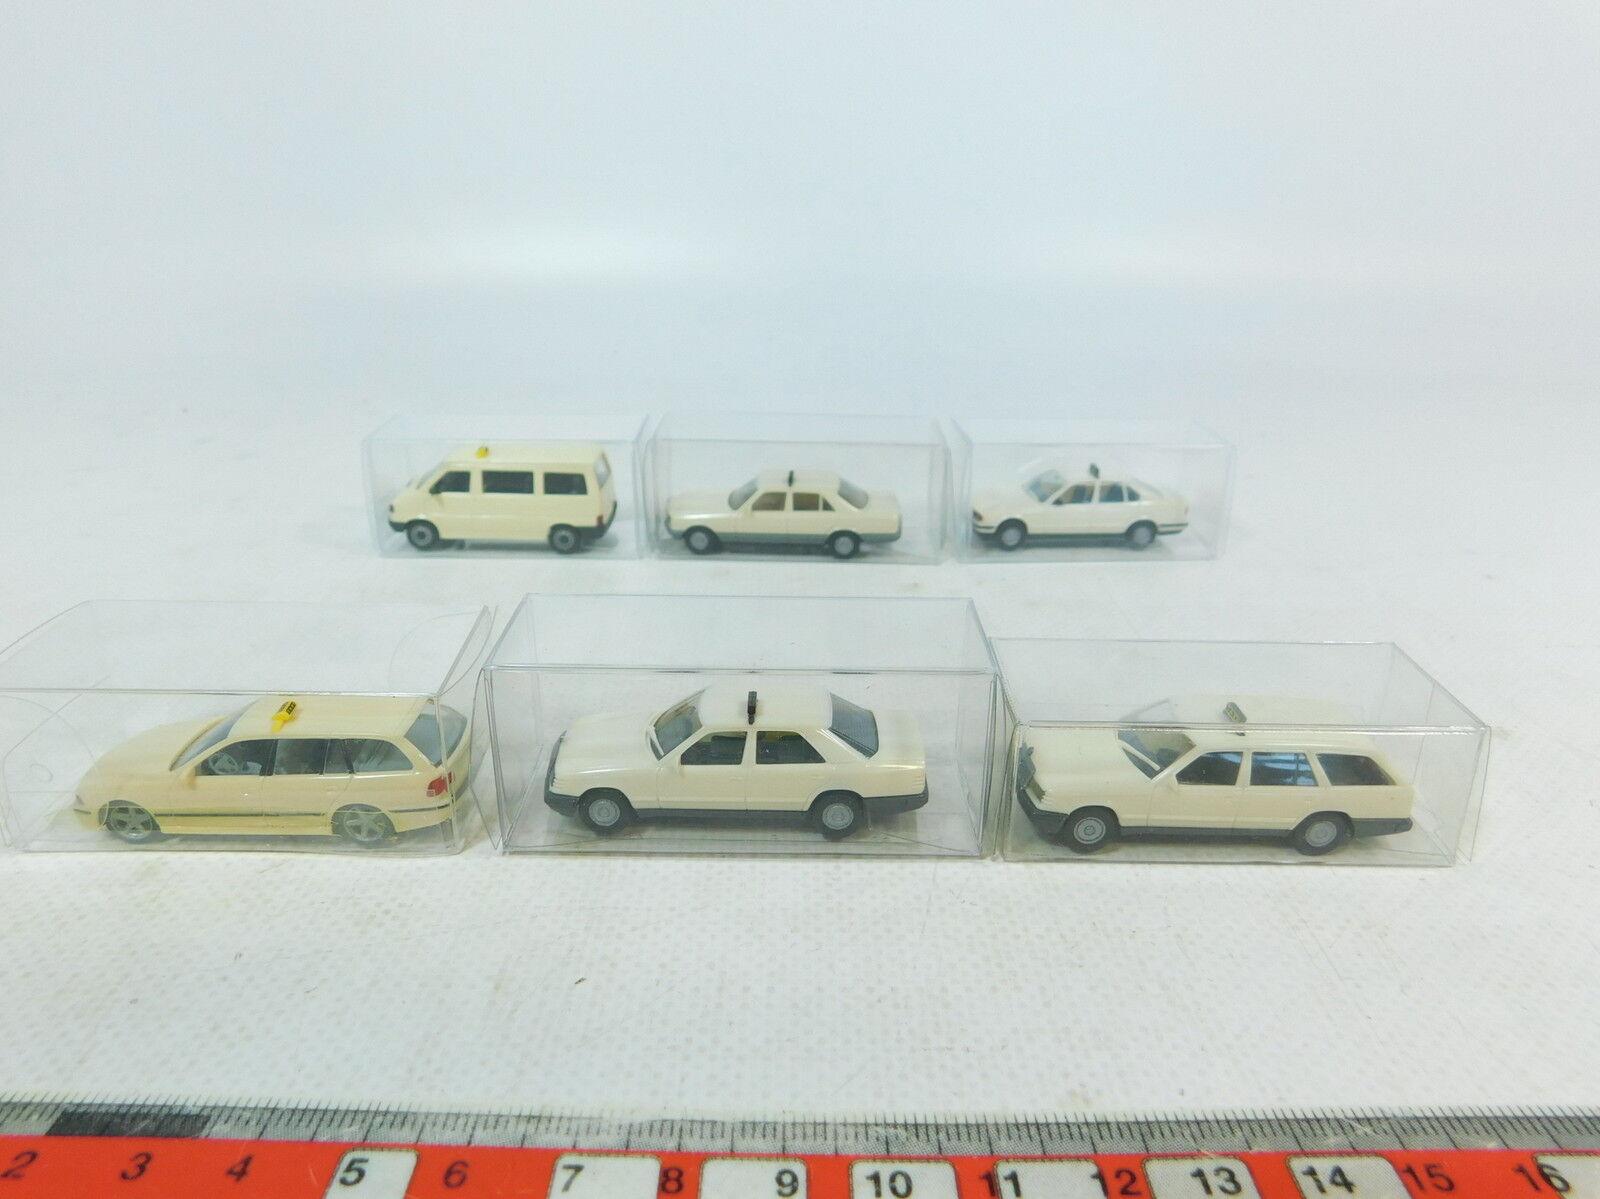 Ax774-0, 5  6x HERPA h0 (1 87) taxi-Modèle  vw CARAVELLE + MERCEDES-BENZ + BMW, Neuw